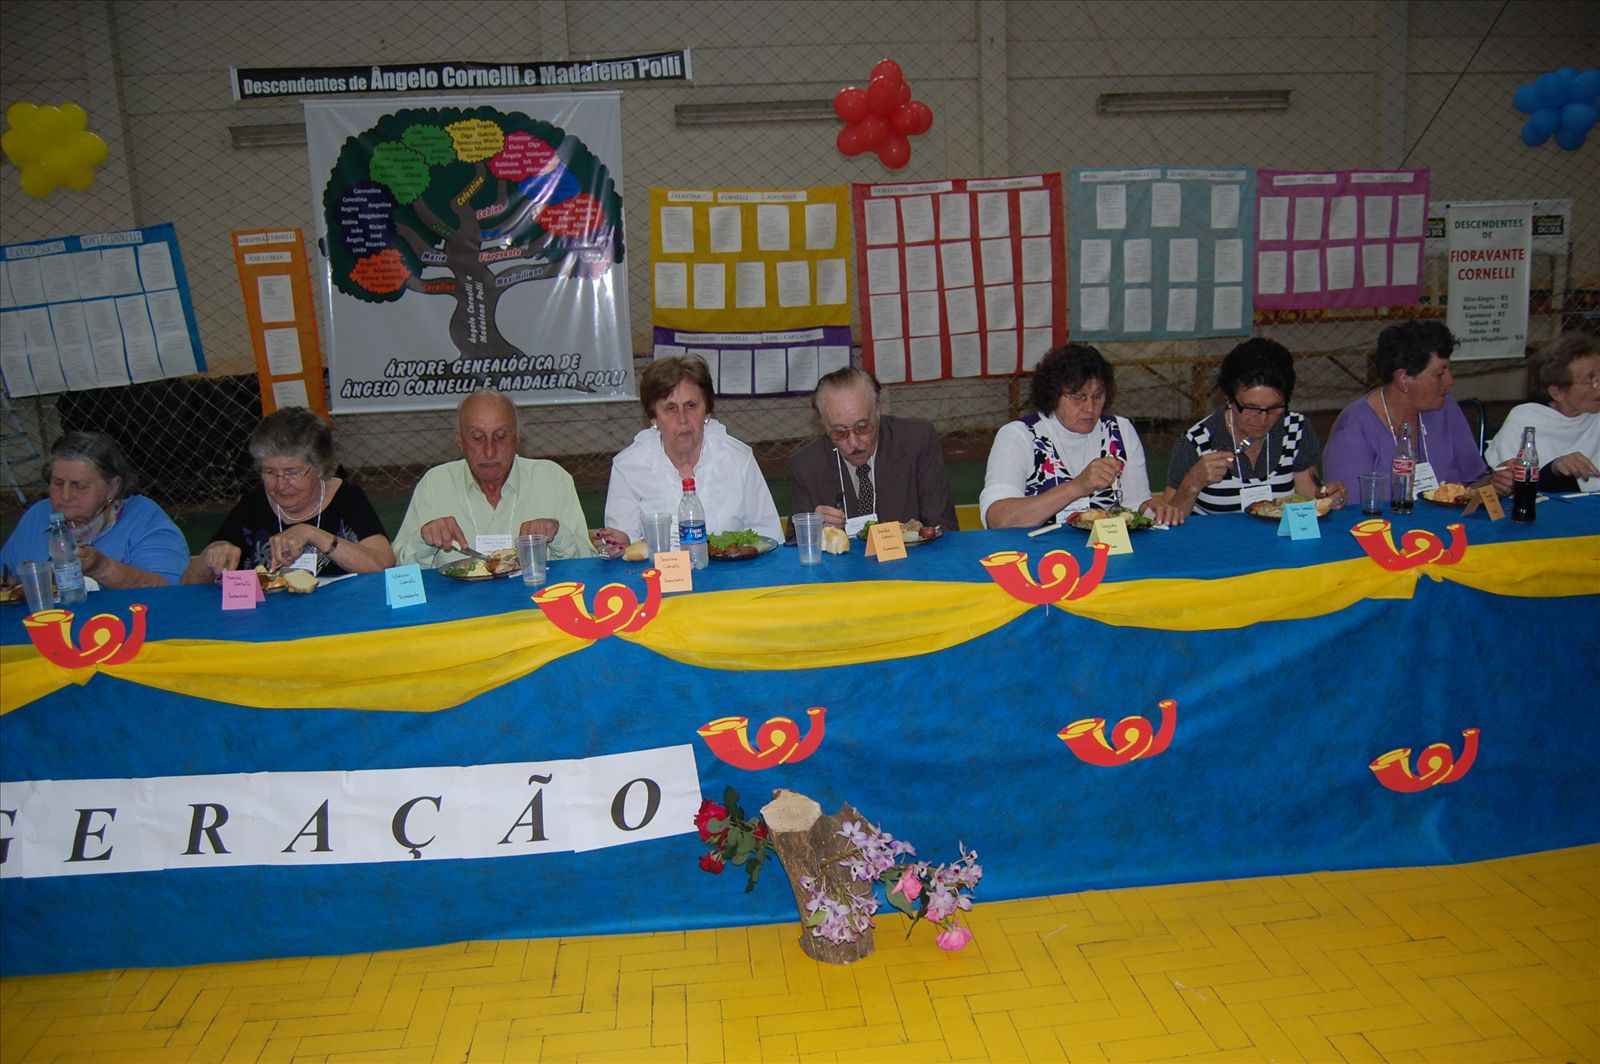 2º Encontro Família Cornelli - 11.10.2009 (233)_0